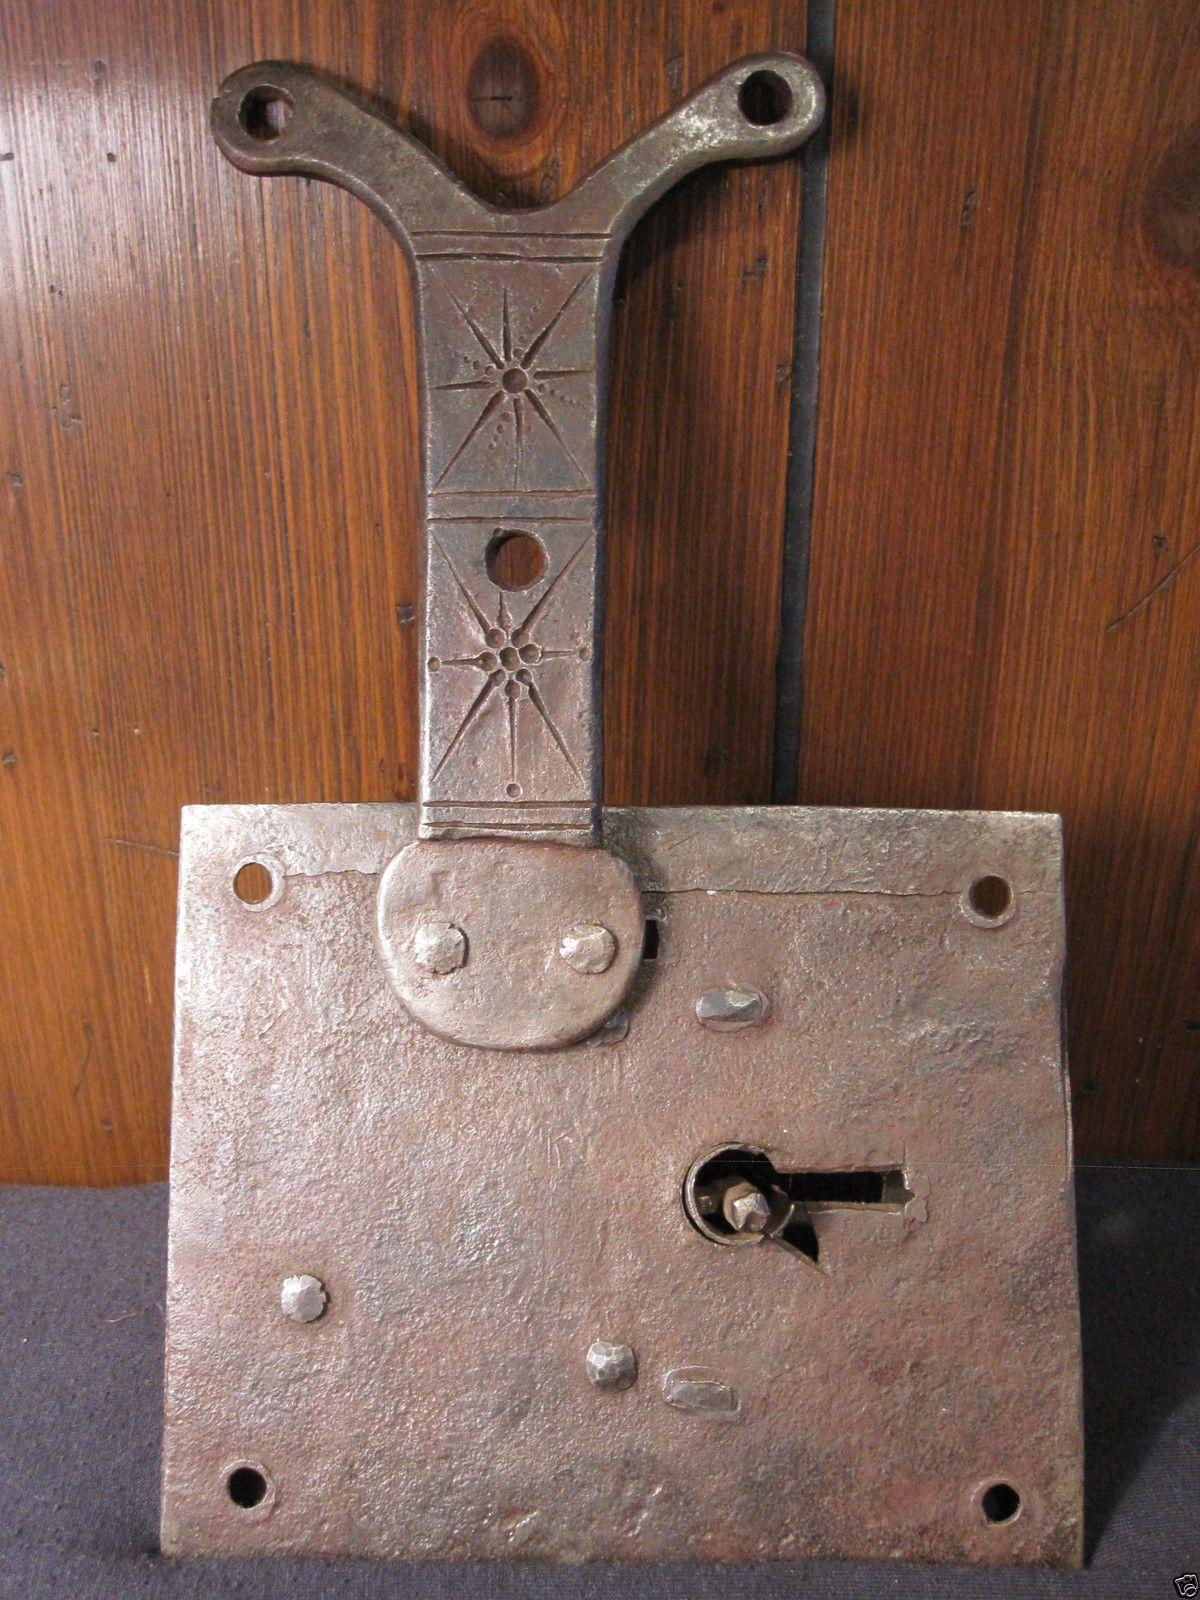 Antique Early American Wrought Iron Decorated Box Lock Conestoga Wagon Pa Ebay Wrought Iron Decor Wrought Iron Decorative Boxes